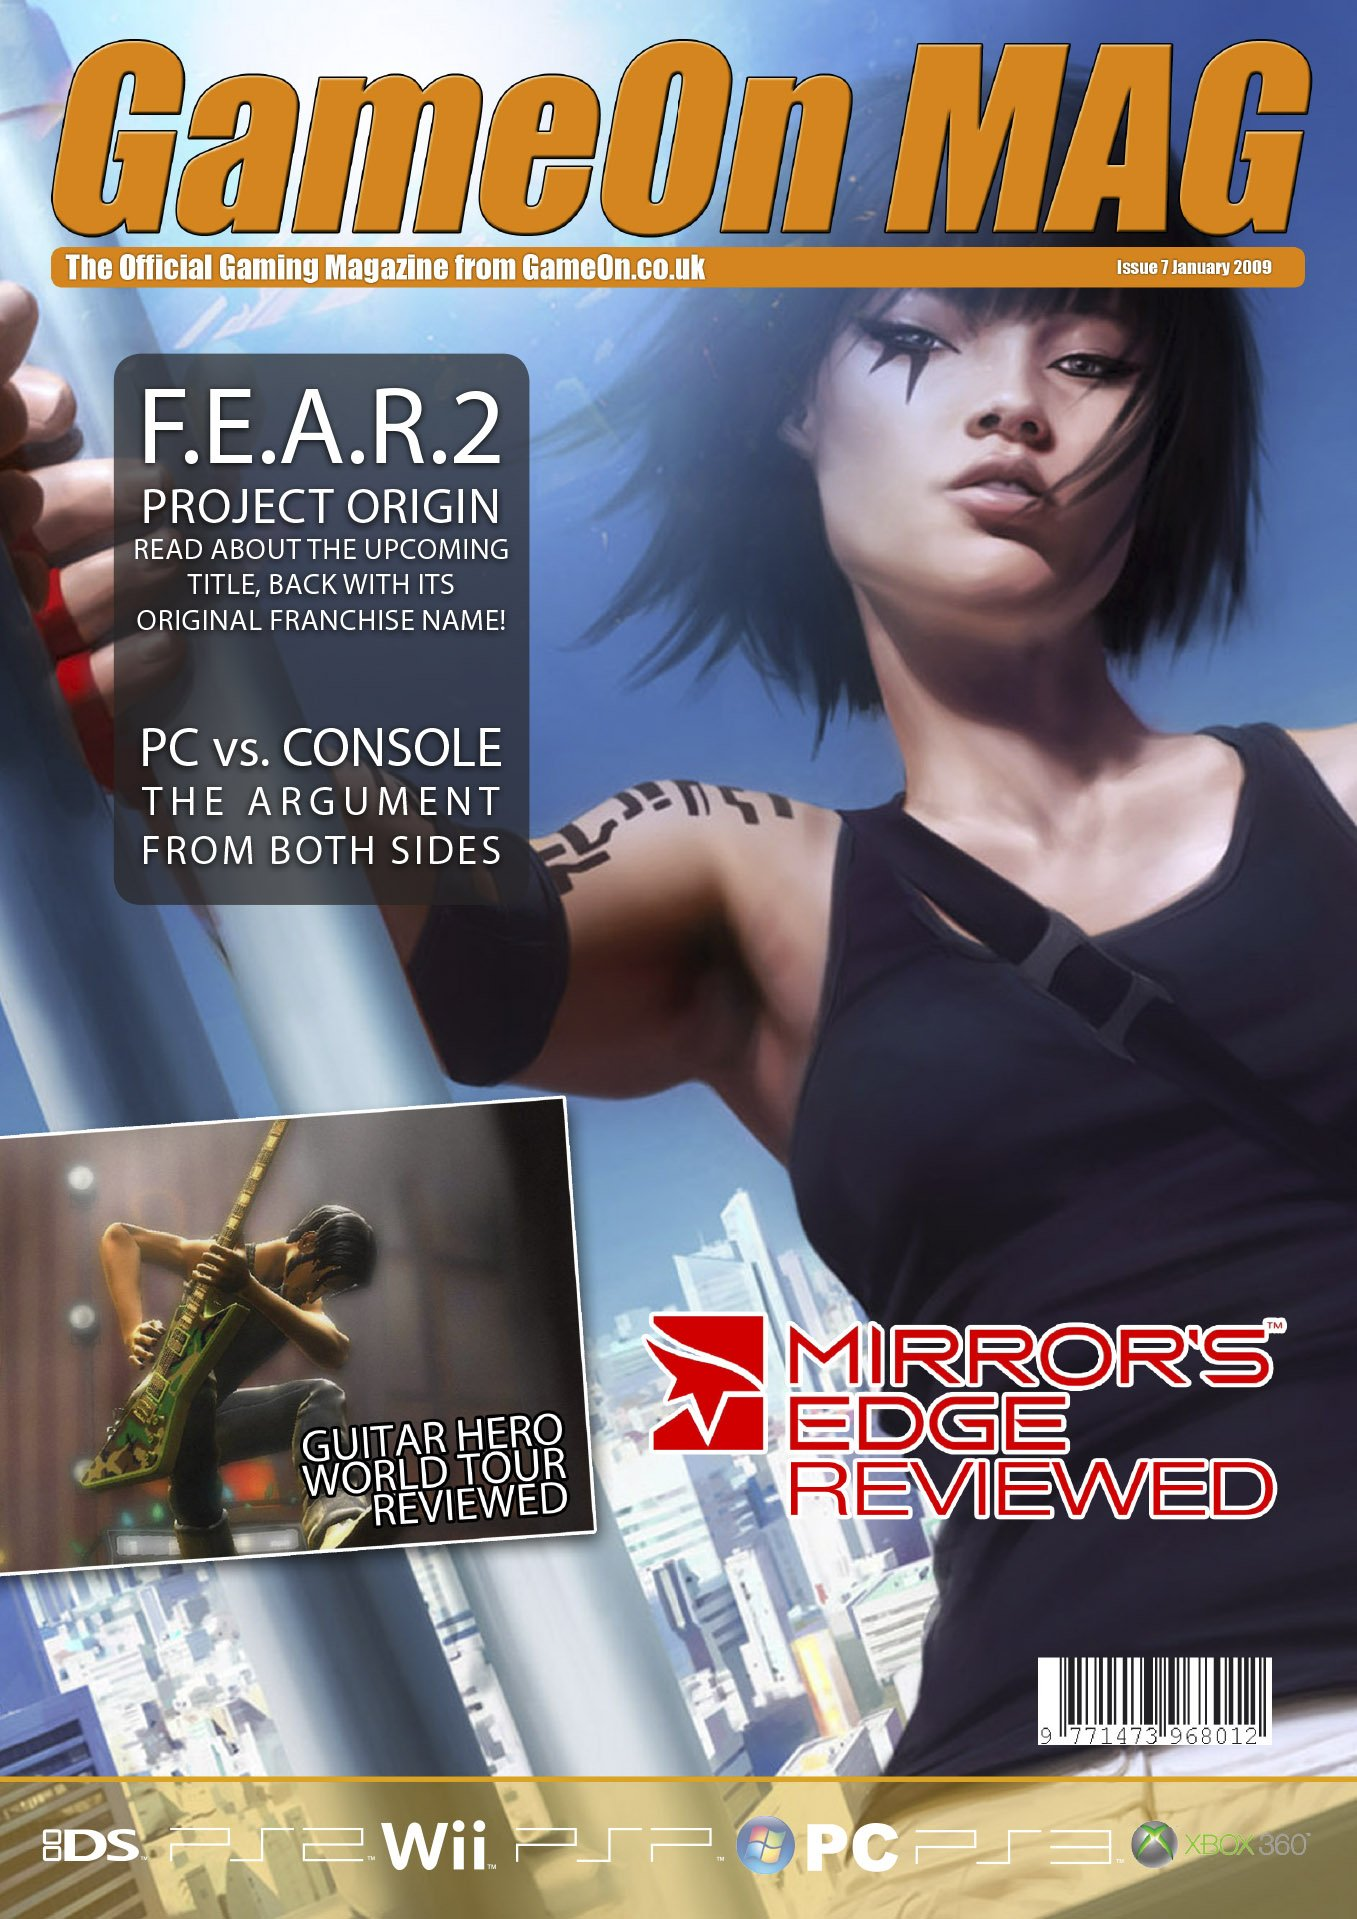 GameOn 007 (January 2009)